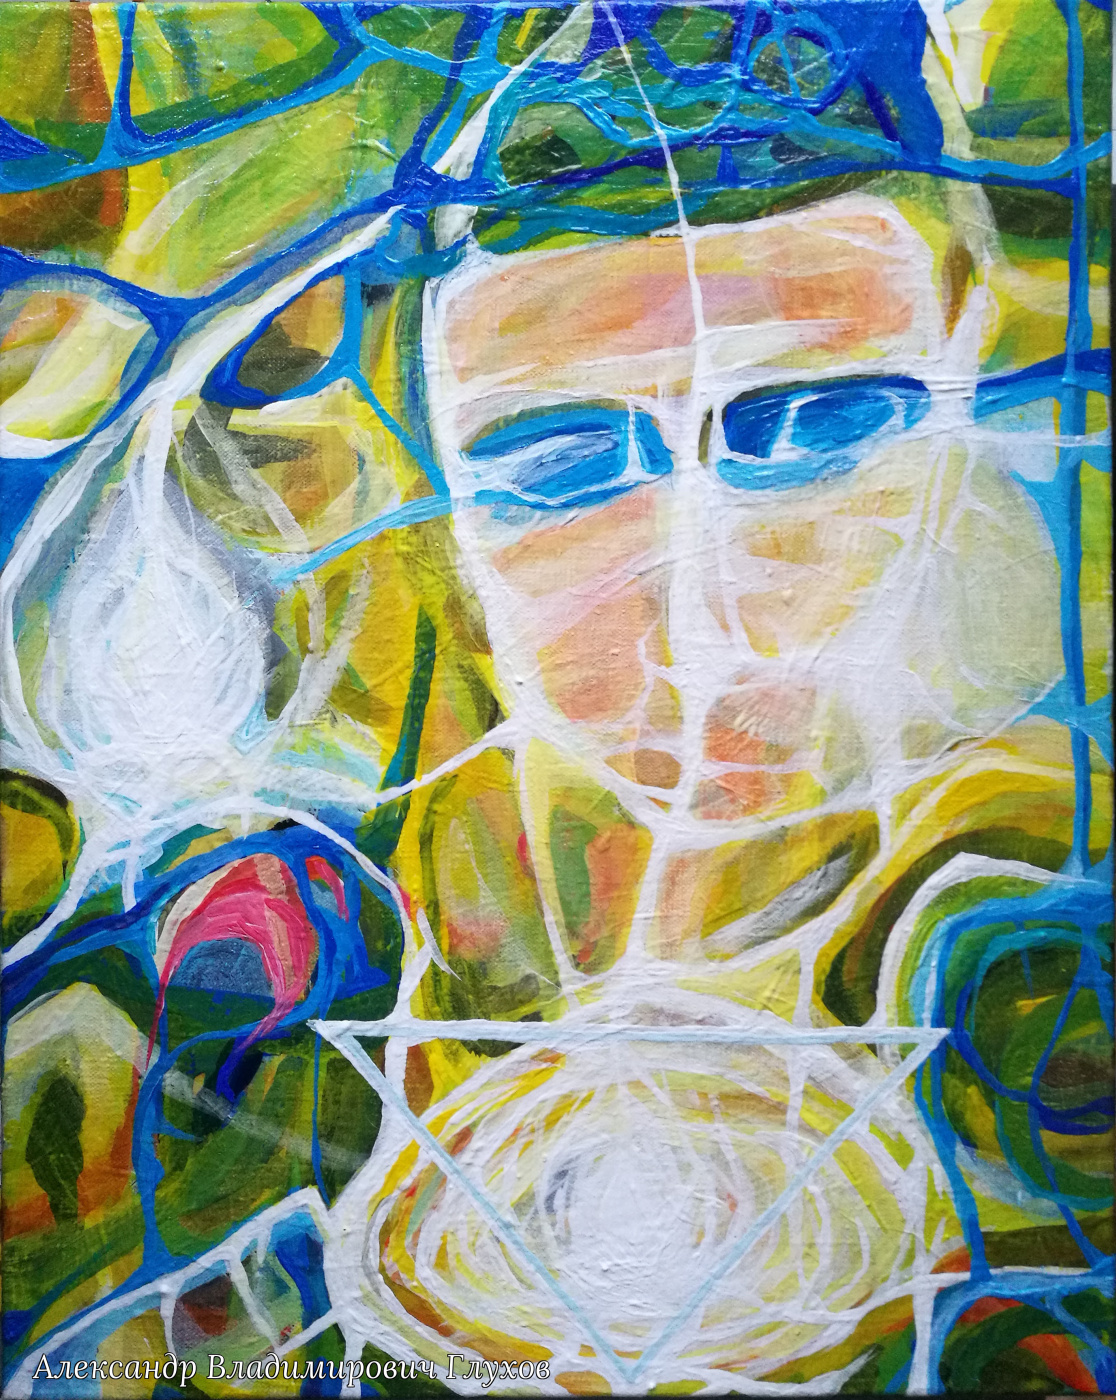 Alexandr Glukhov. A Light to Light